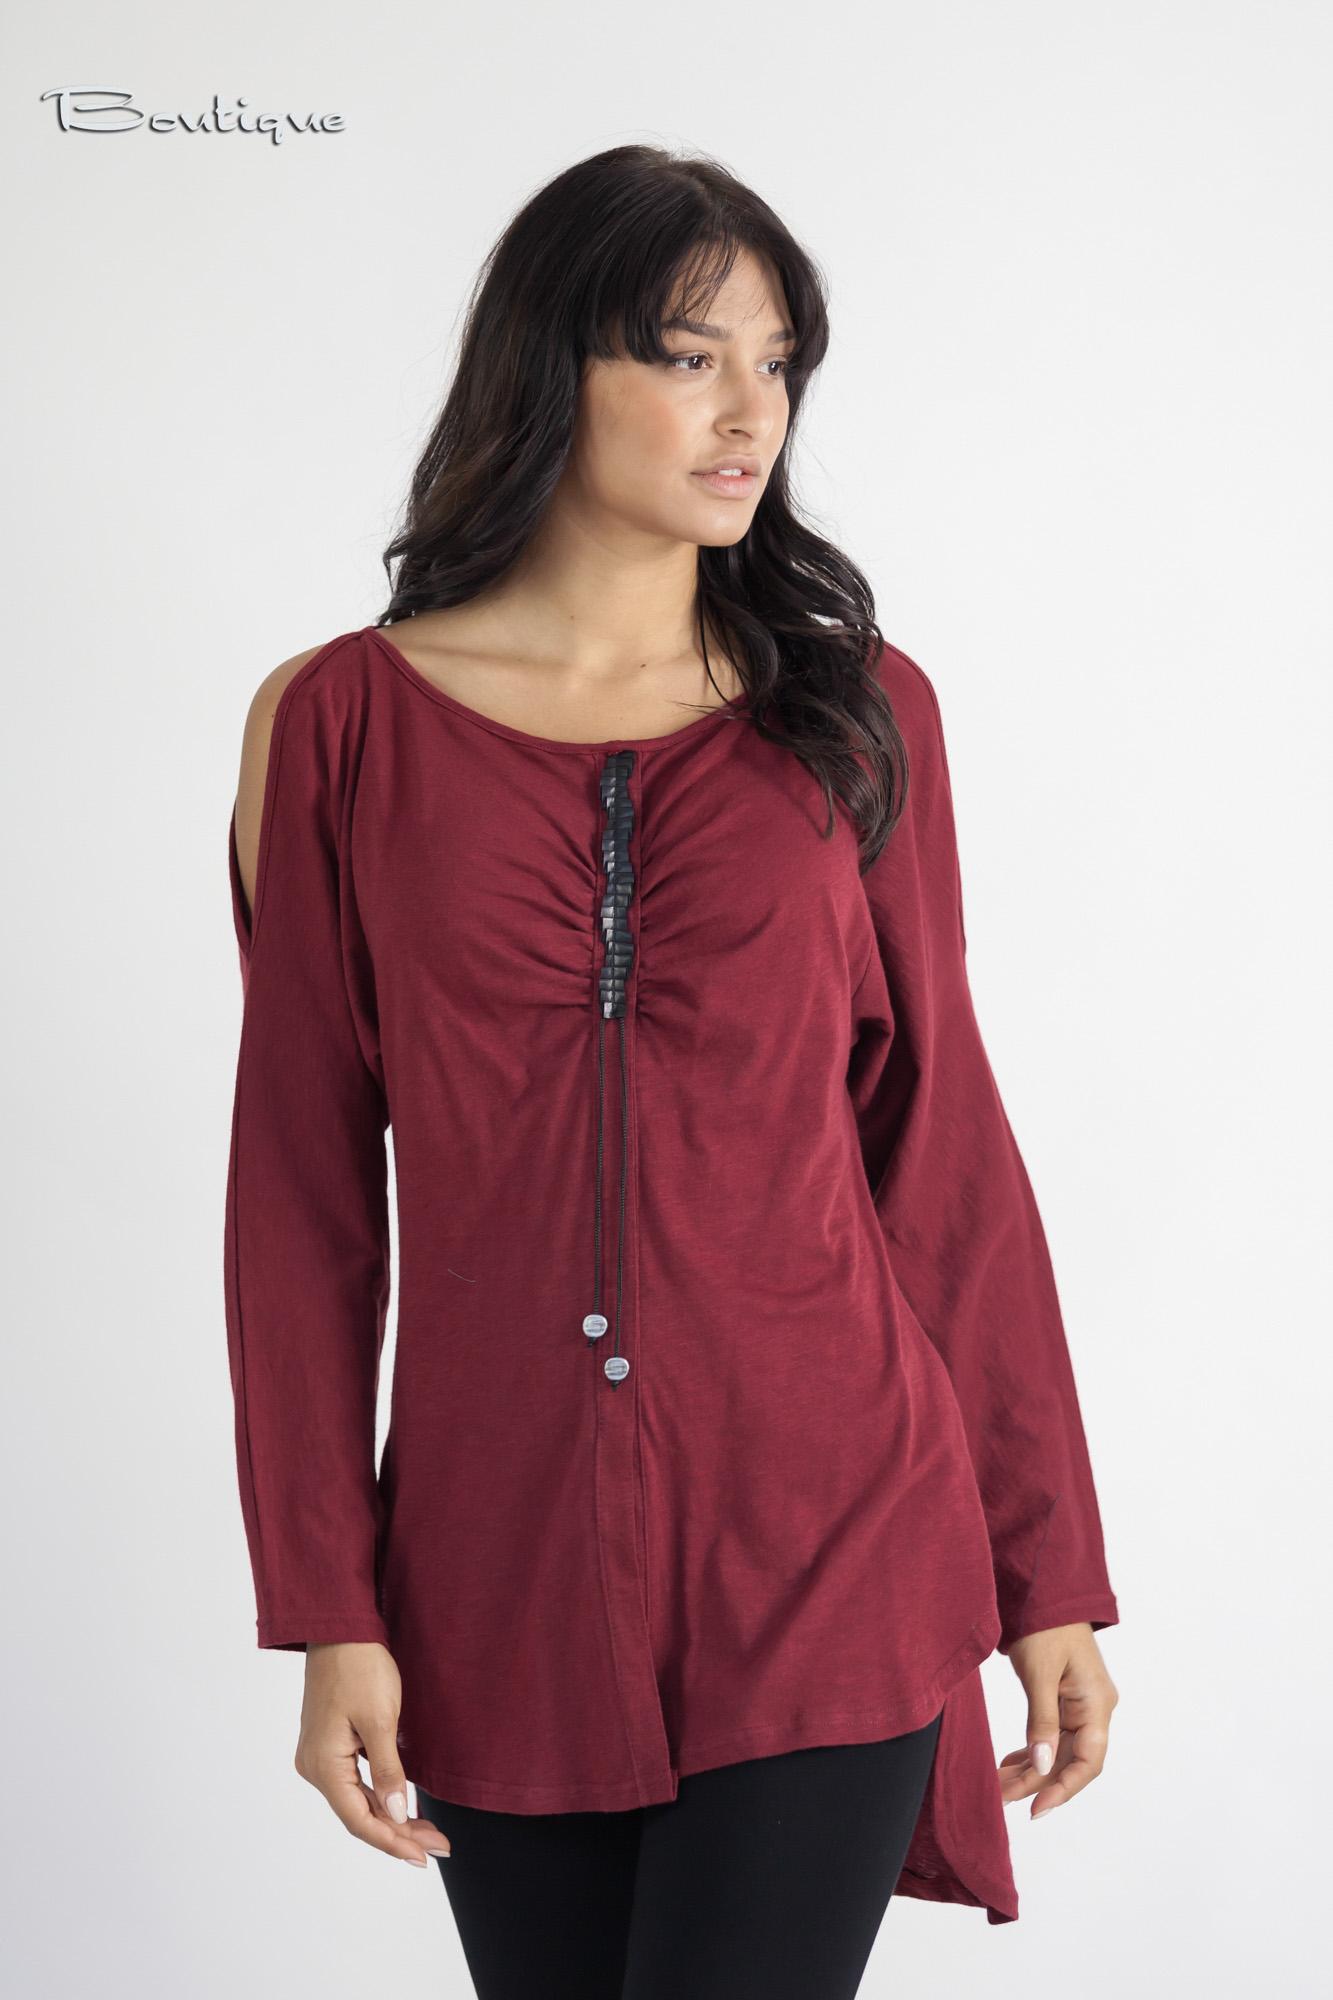 40f9ff7440 Μπλούζα Μ.Μ στυλ πουκάμισο με δερμάτινη λεπτομέρεια - 3037 ...